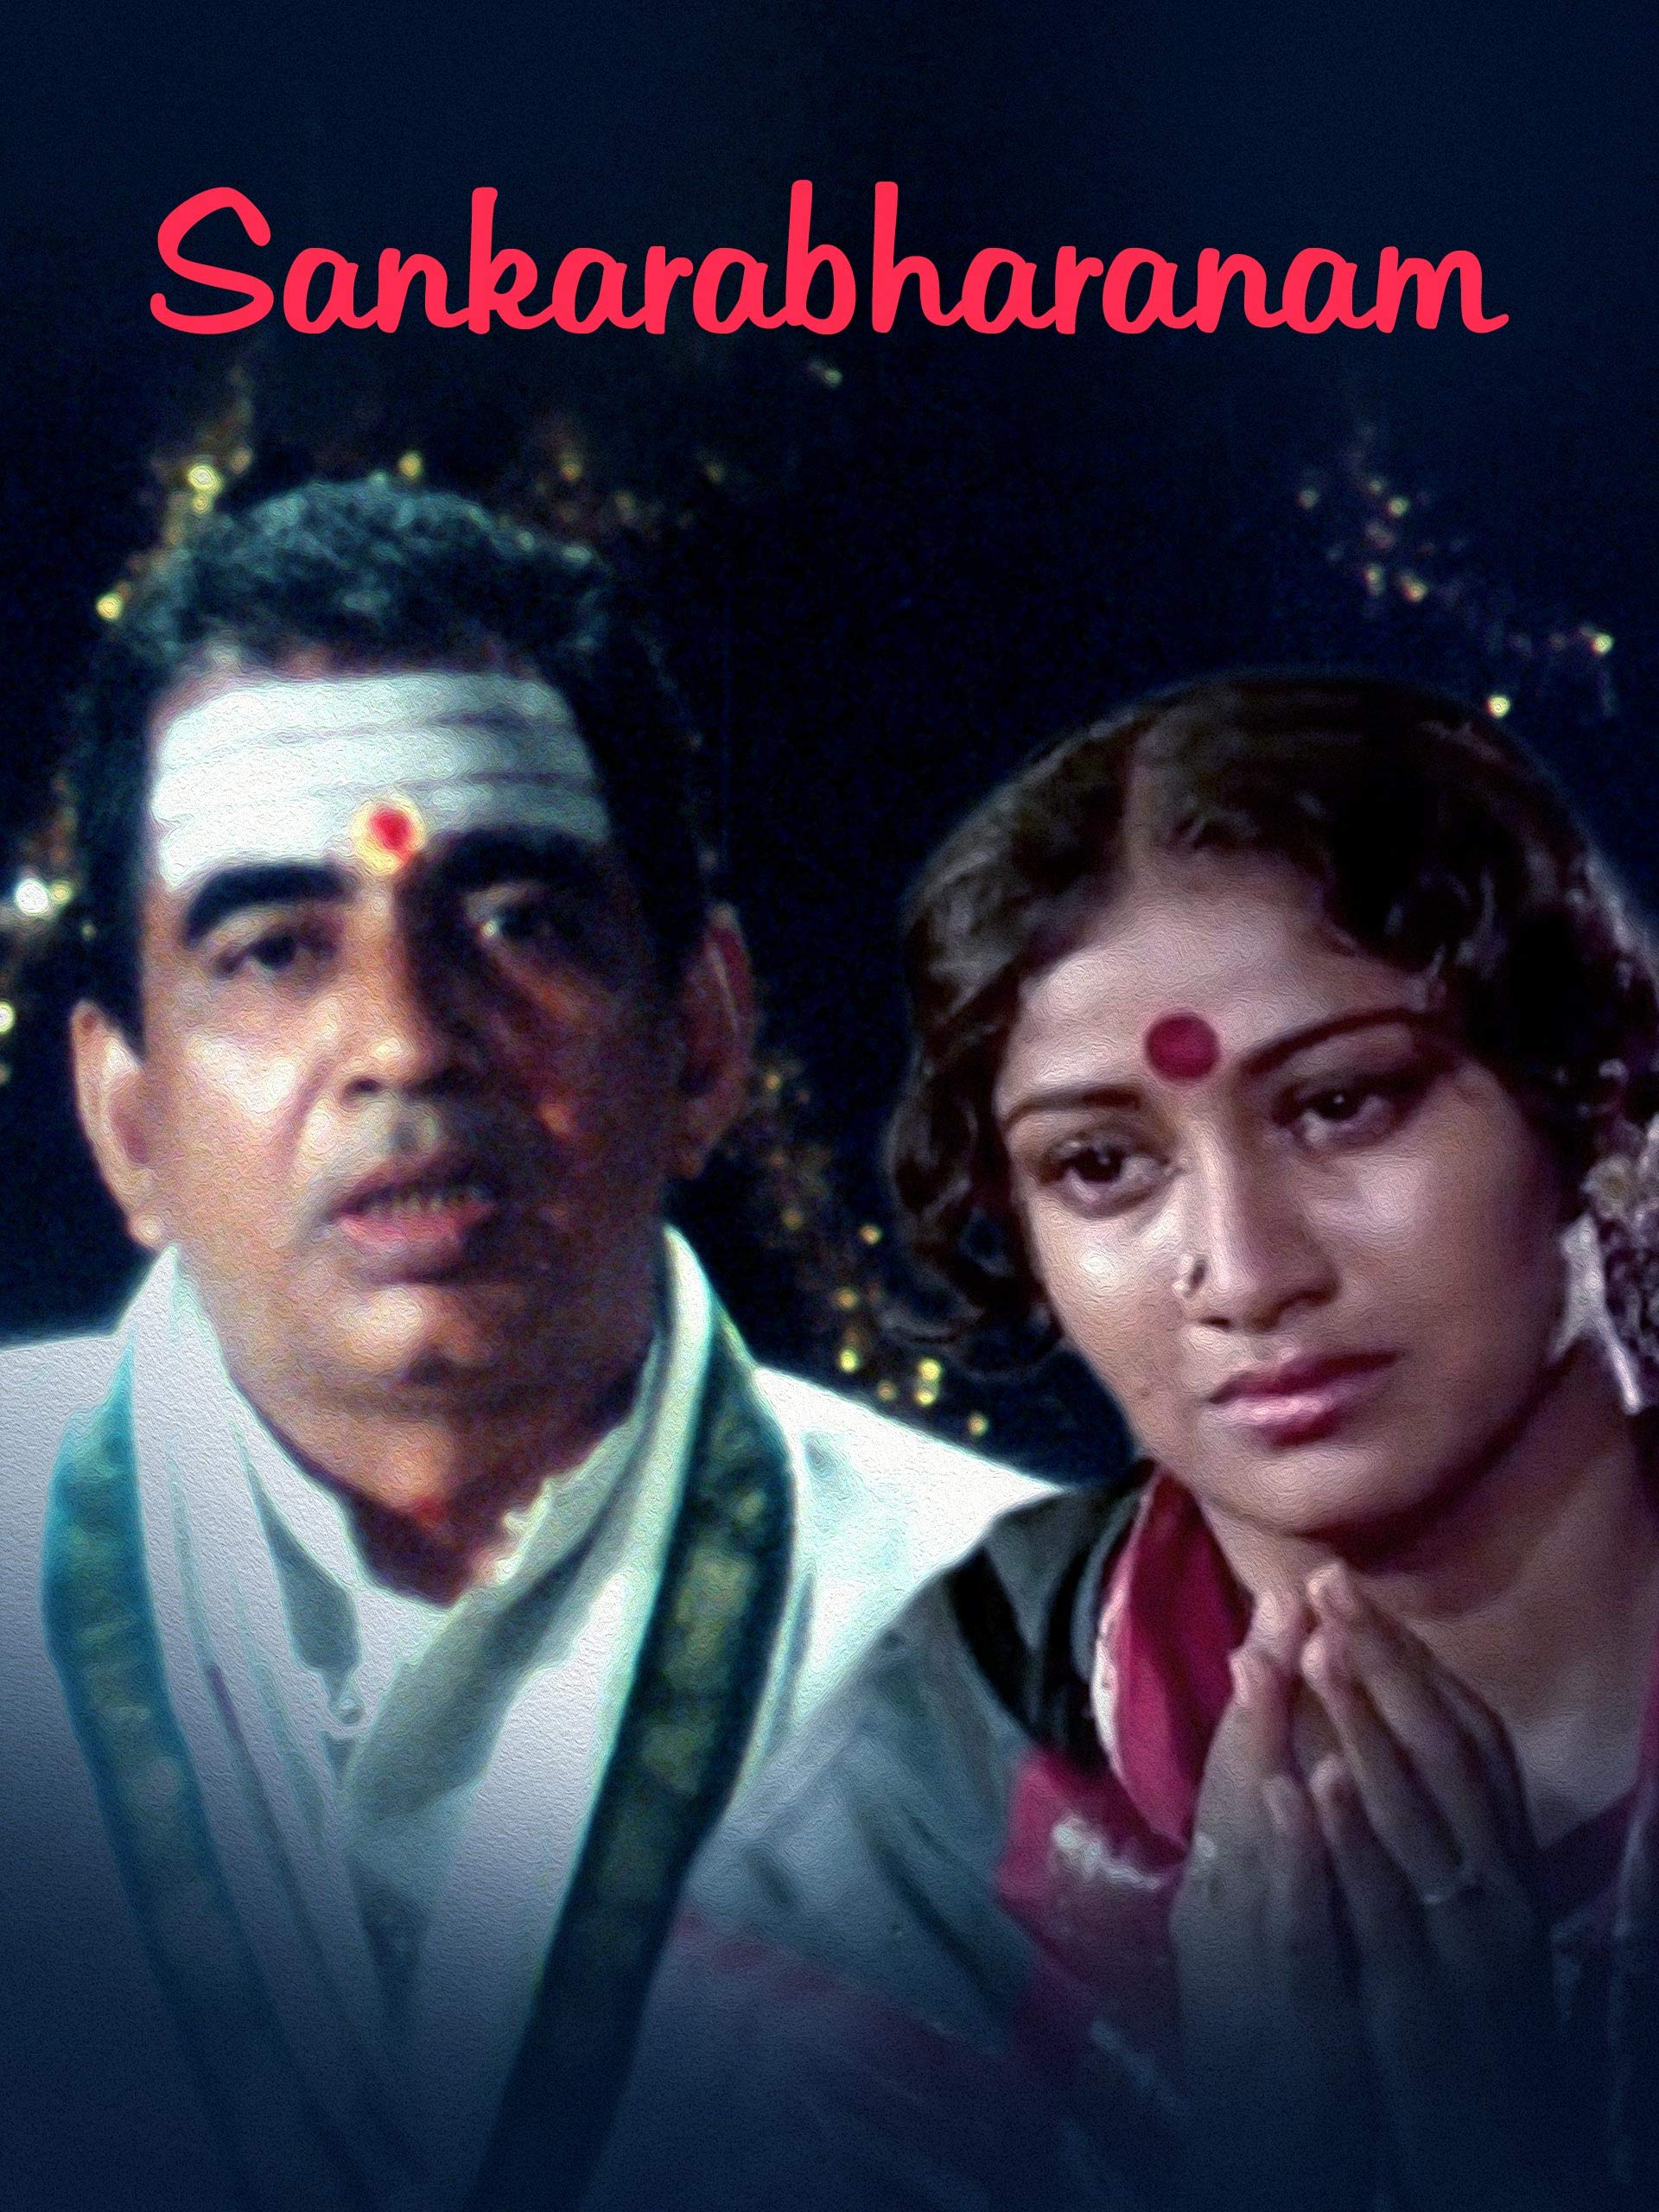 sankarabharanam songs download free